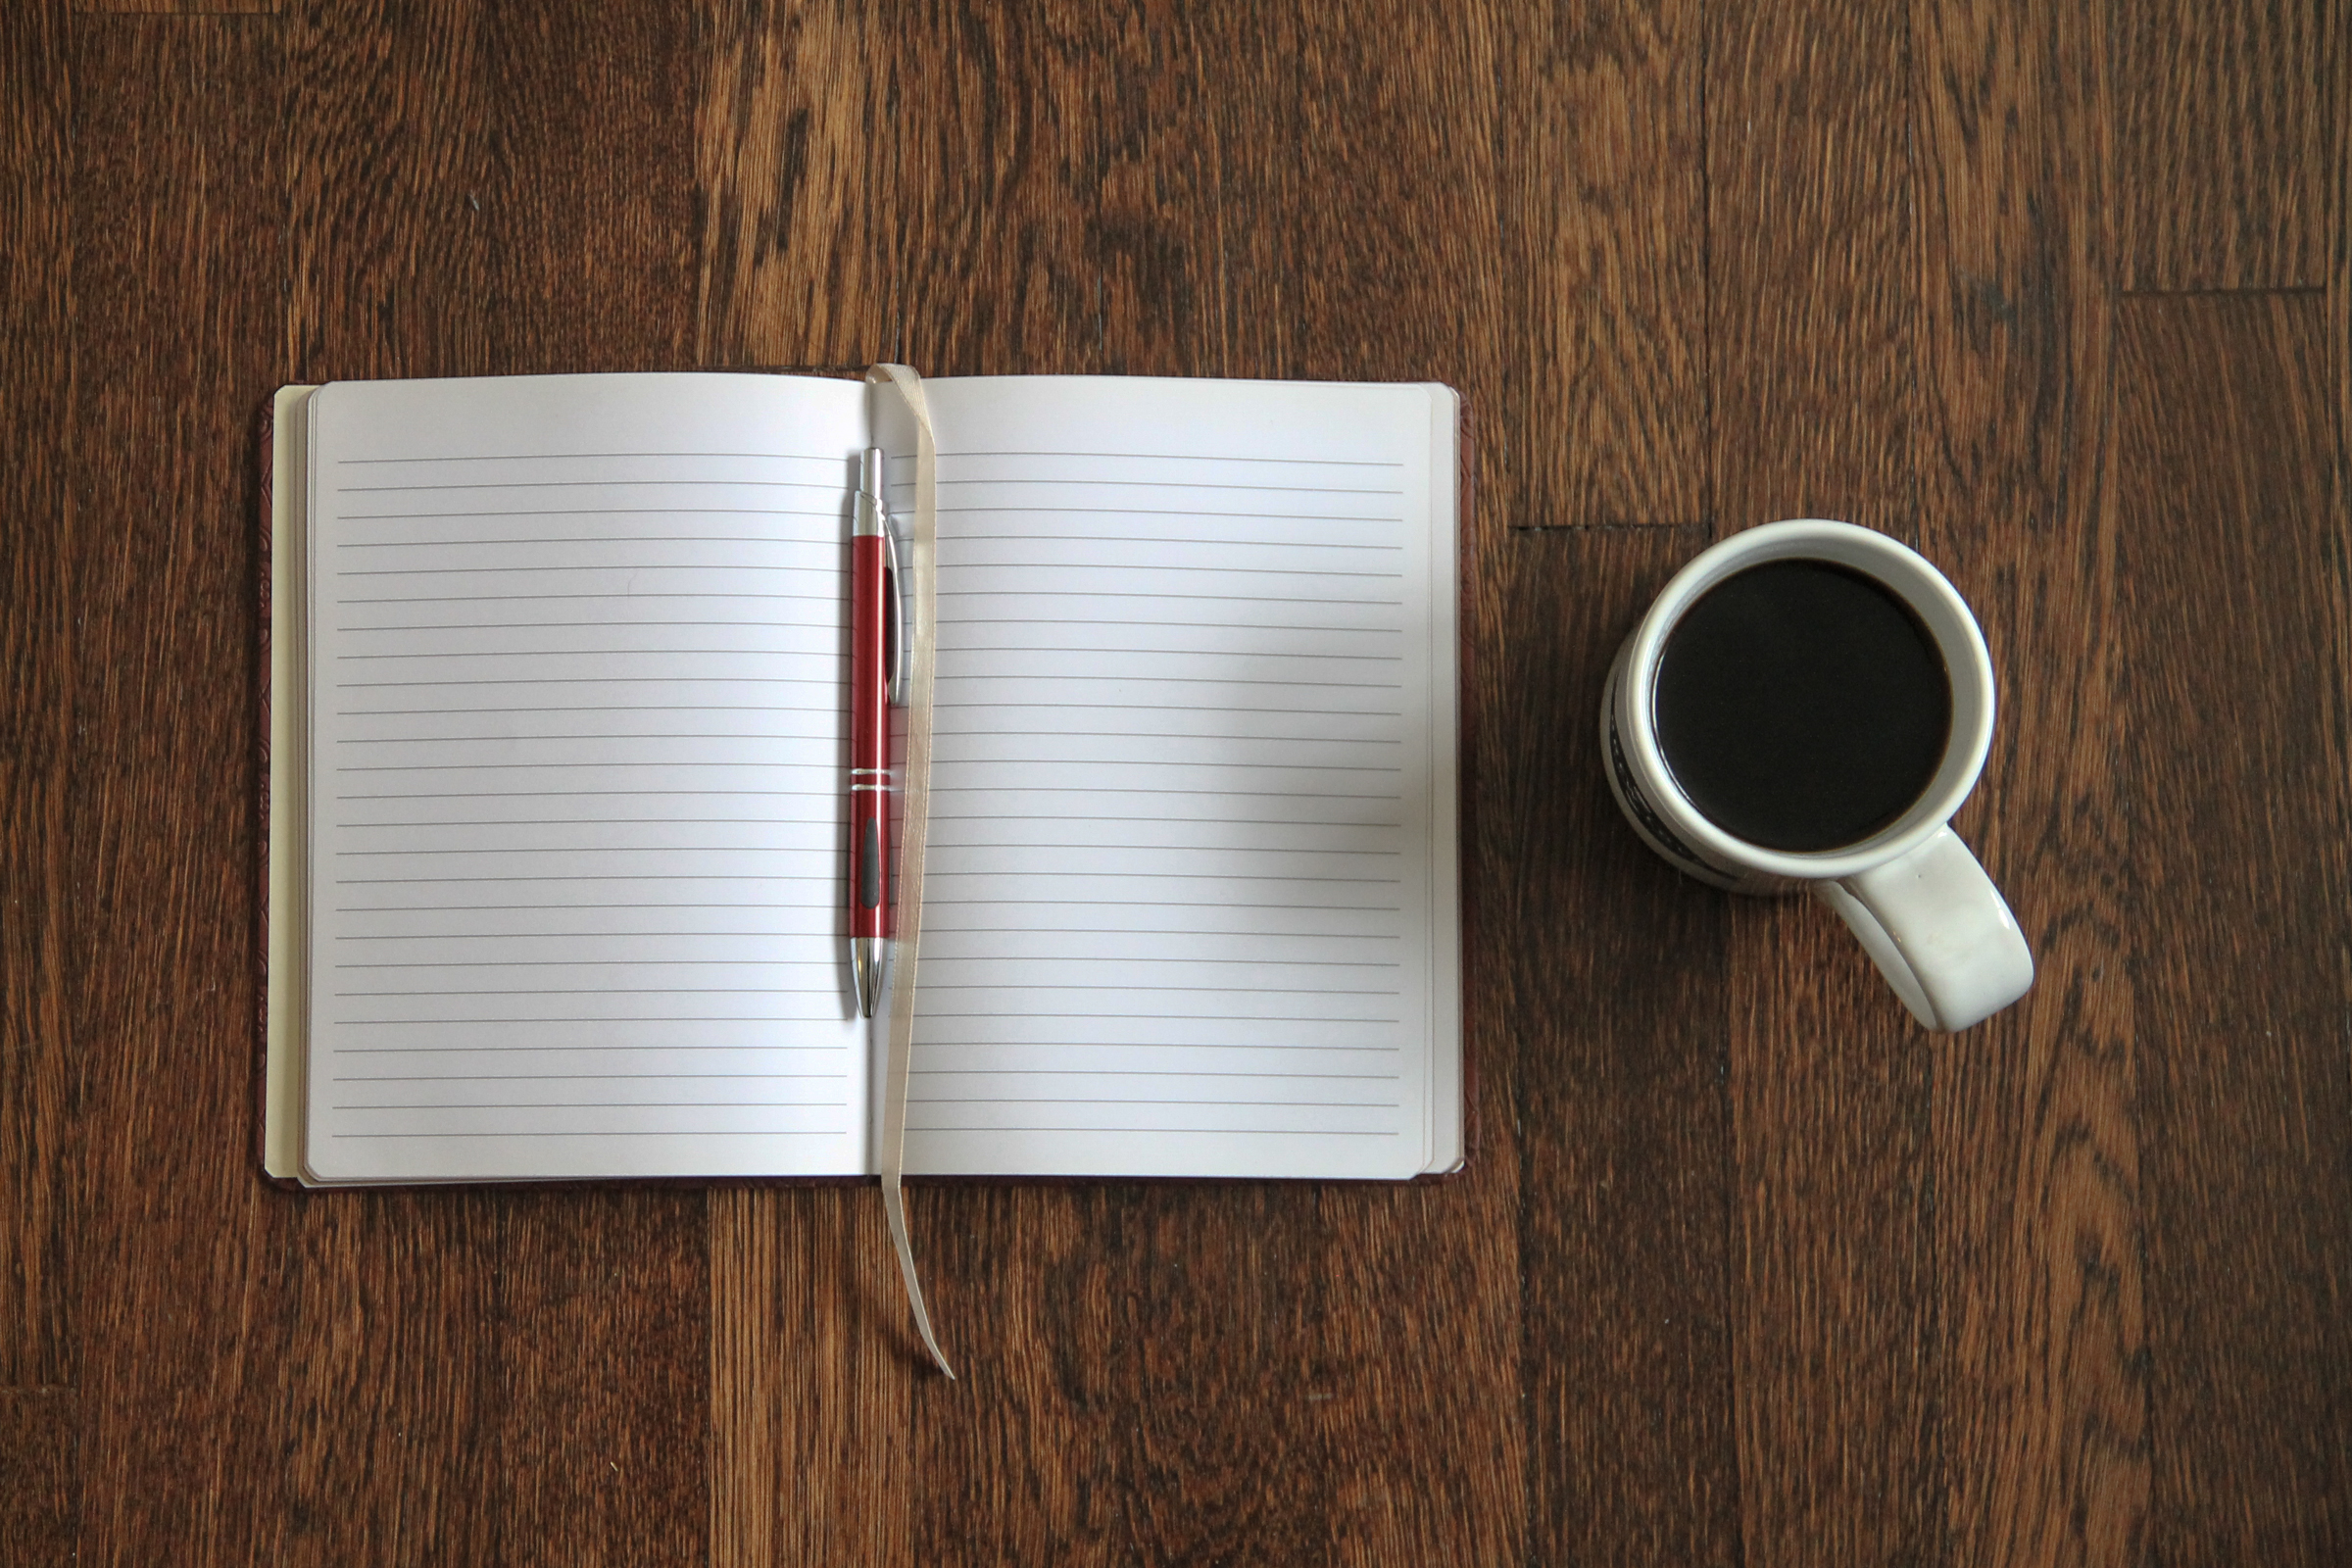 Free Stock Photo of Blank Open Notebook & Coffee on Desk